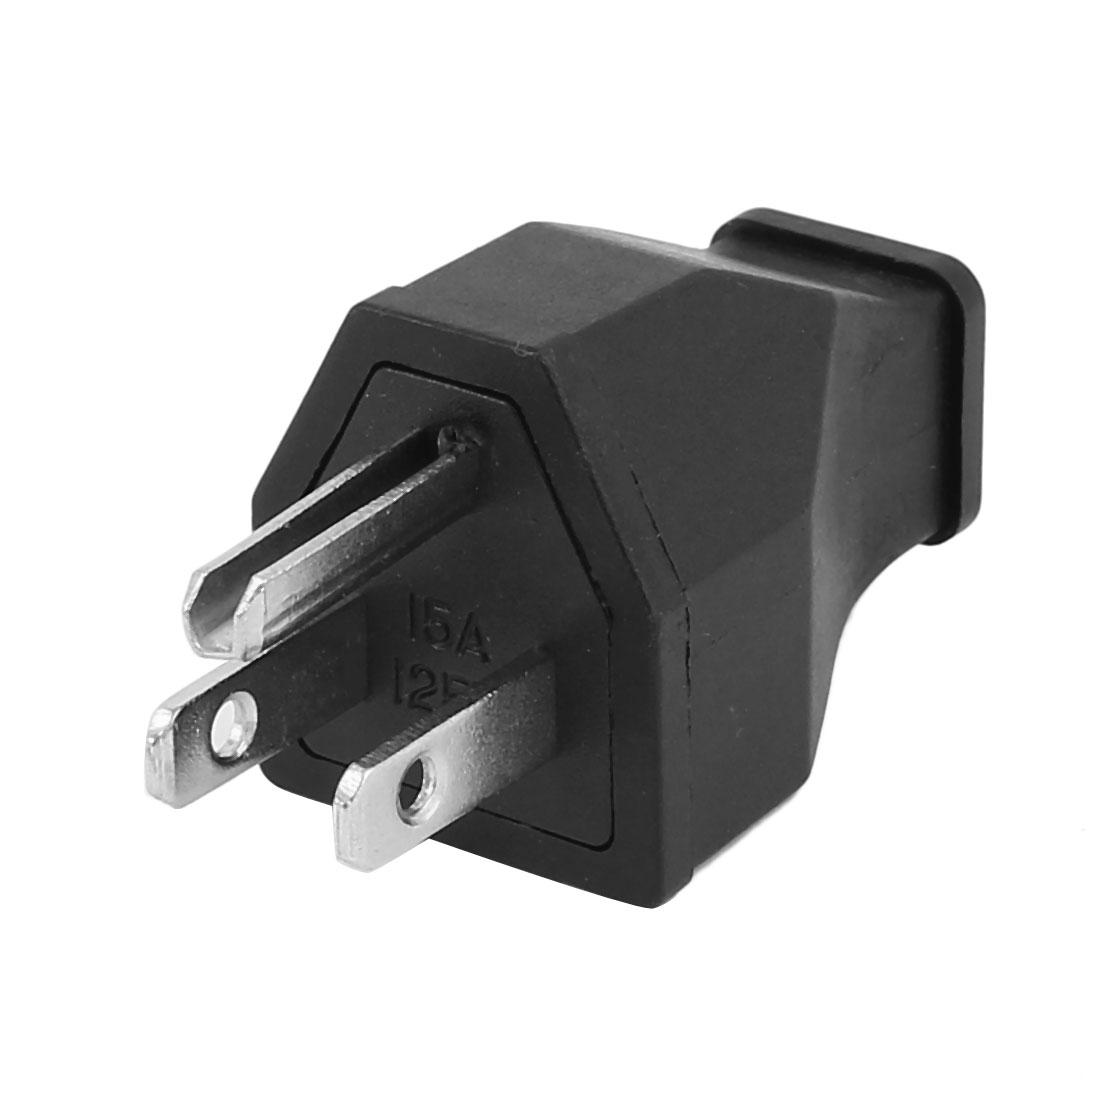 AC 125V US Plug Rewiring Universal Travel Power Socket Adaptor